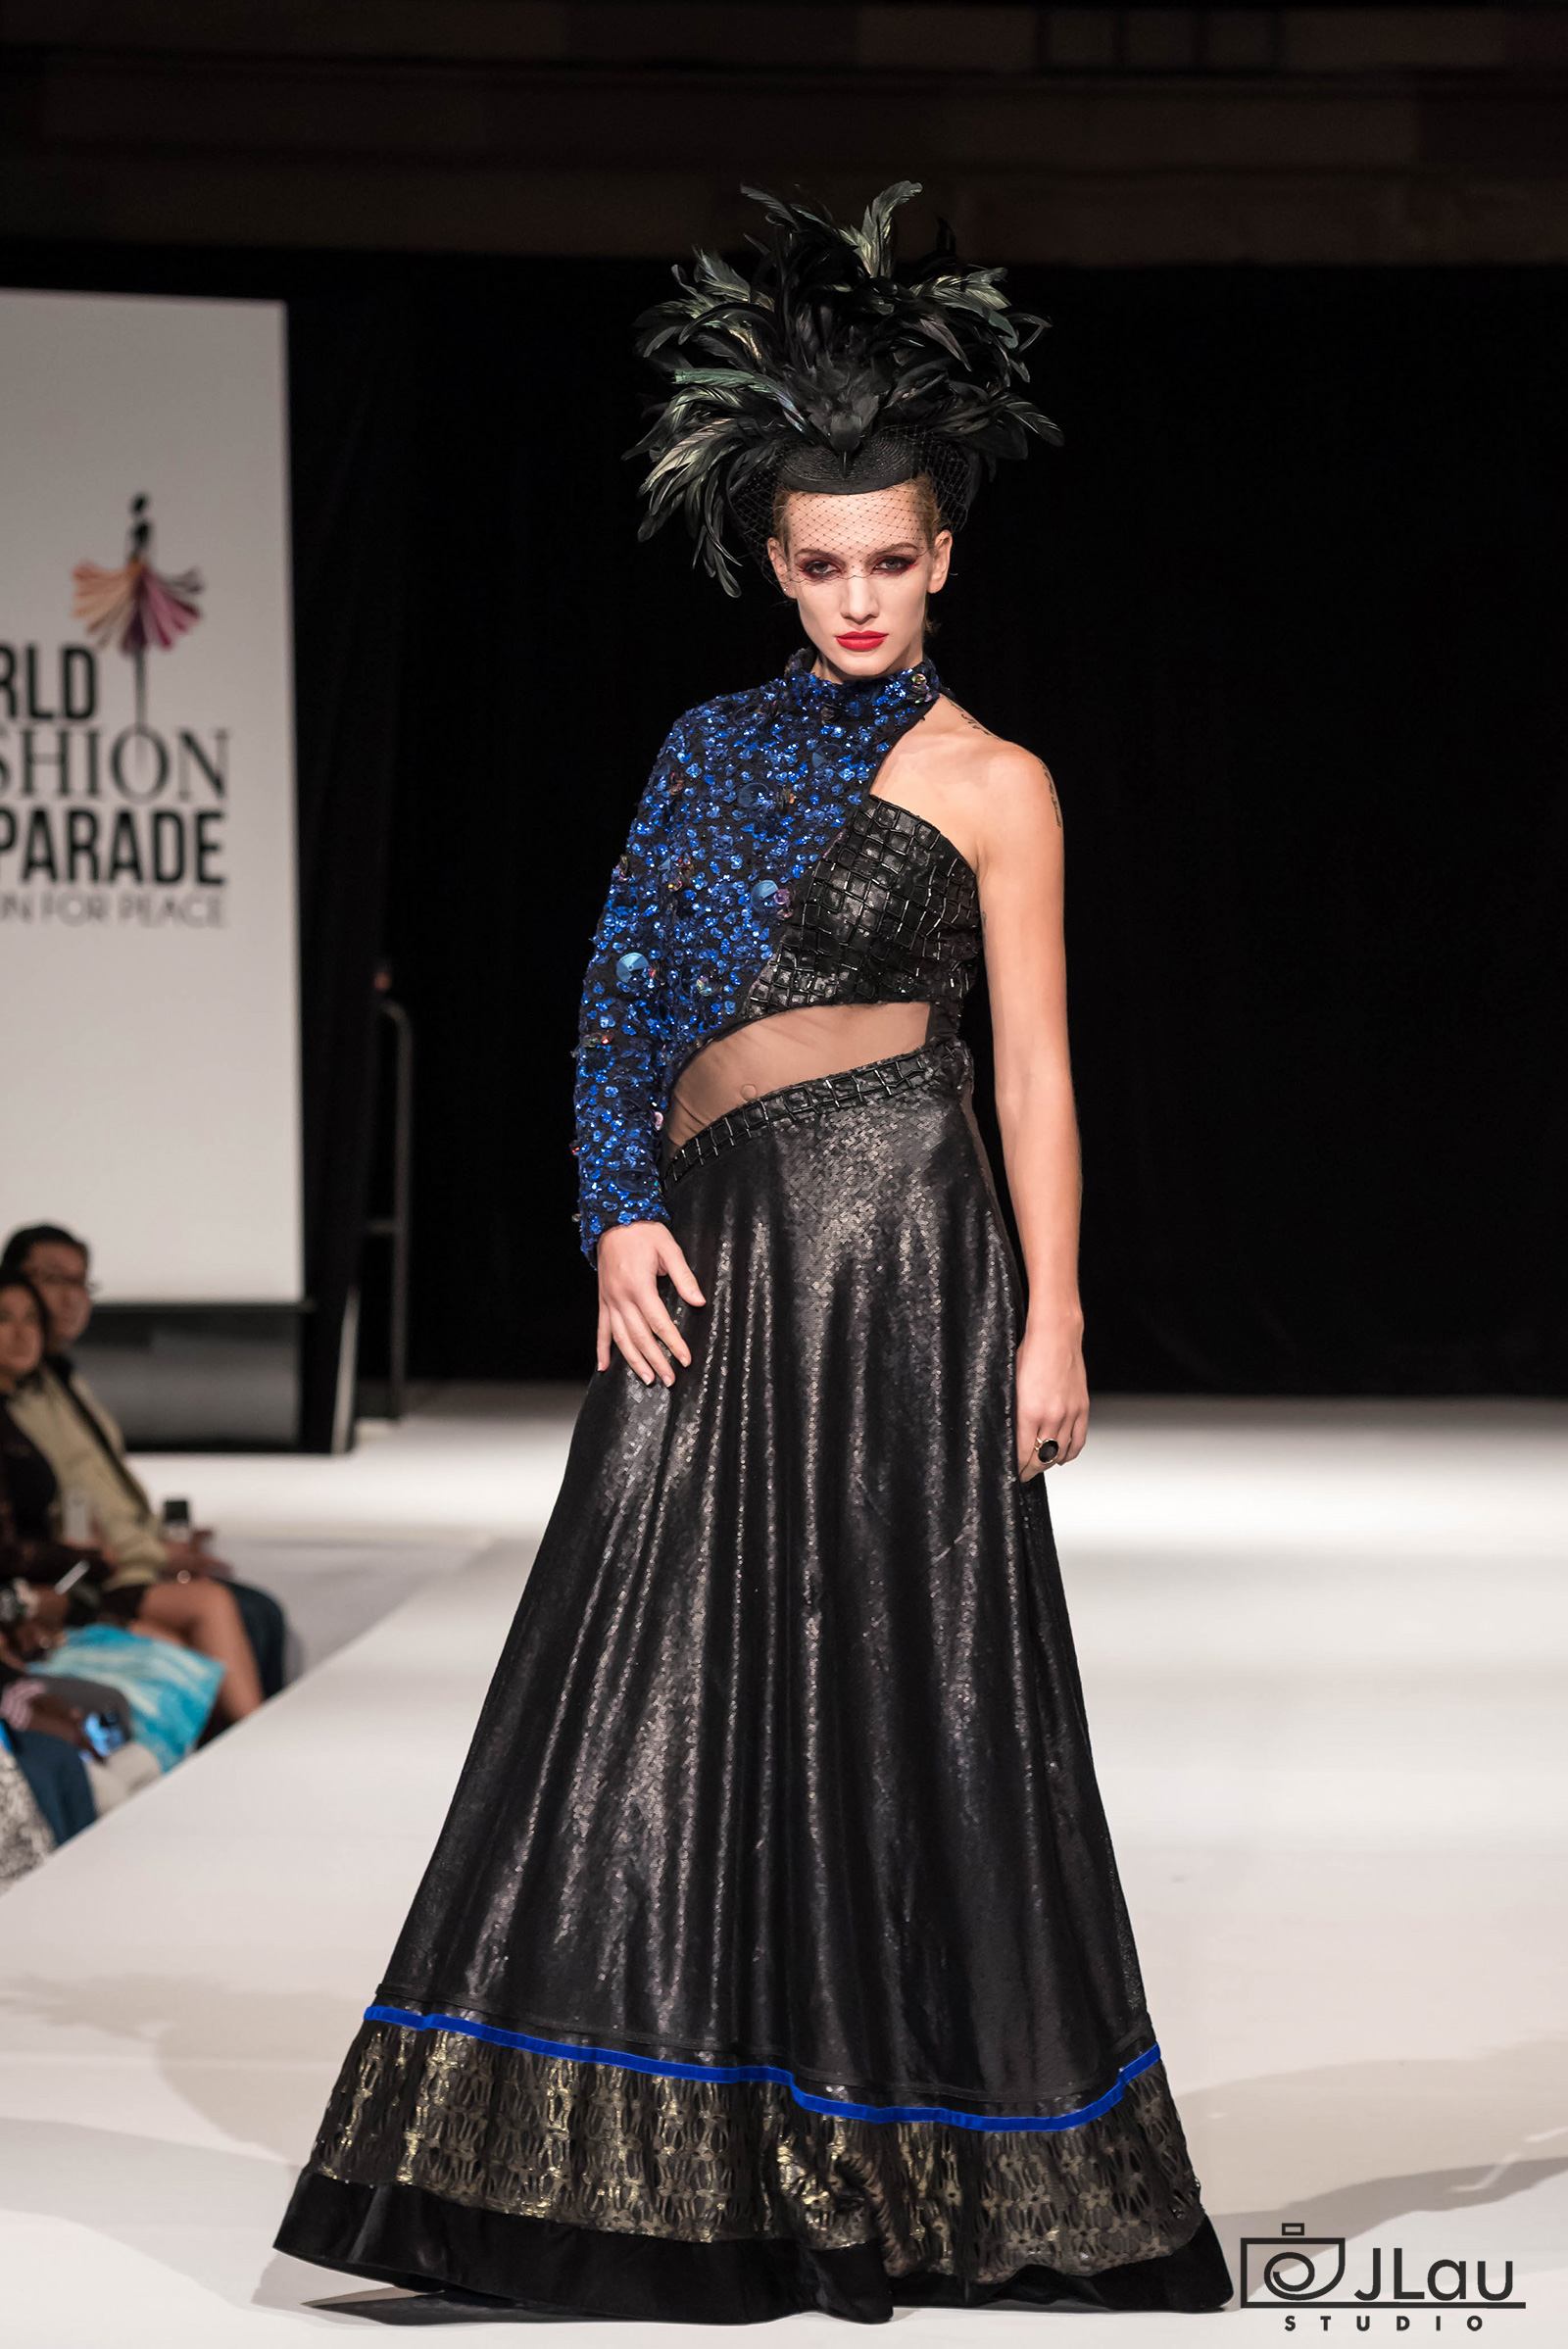 World Fashion parade Designer: Re'Malhi